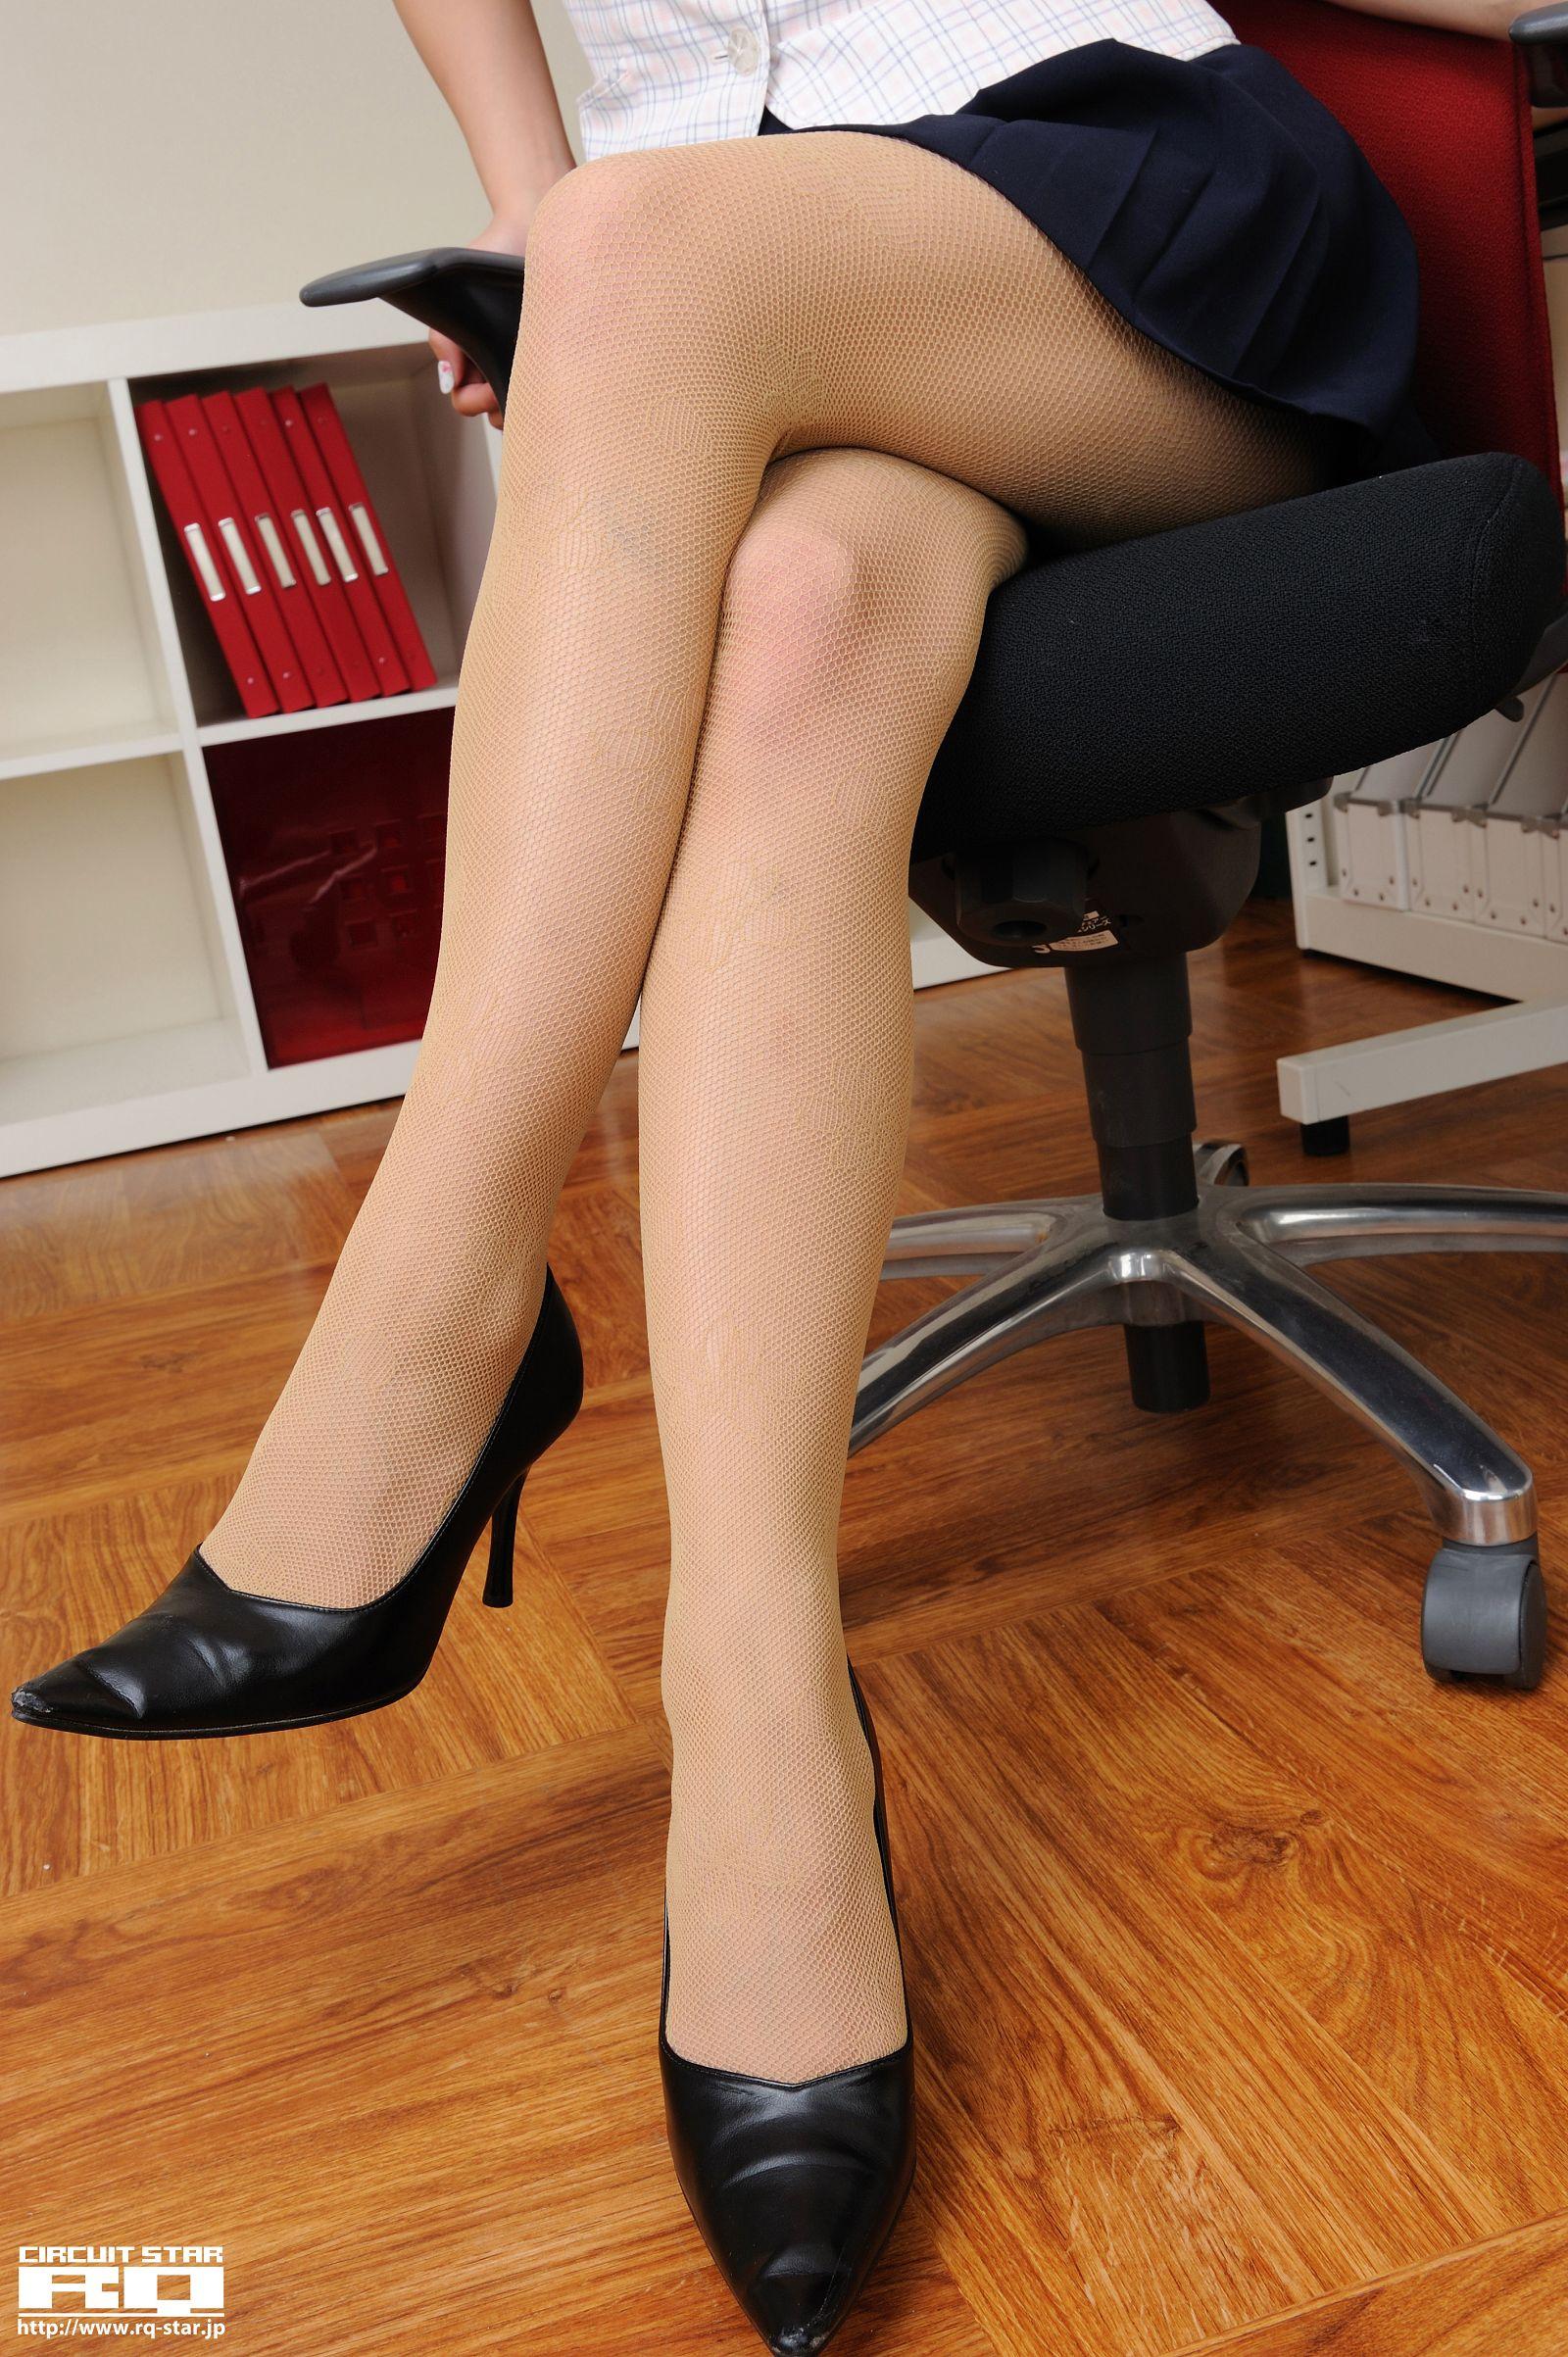 [RQ STAR美女] NO.00469 Megumi Haruna 春菜めぐみ Office Lady[96P] RQ STAR 第2张